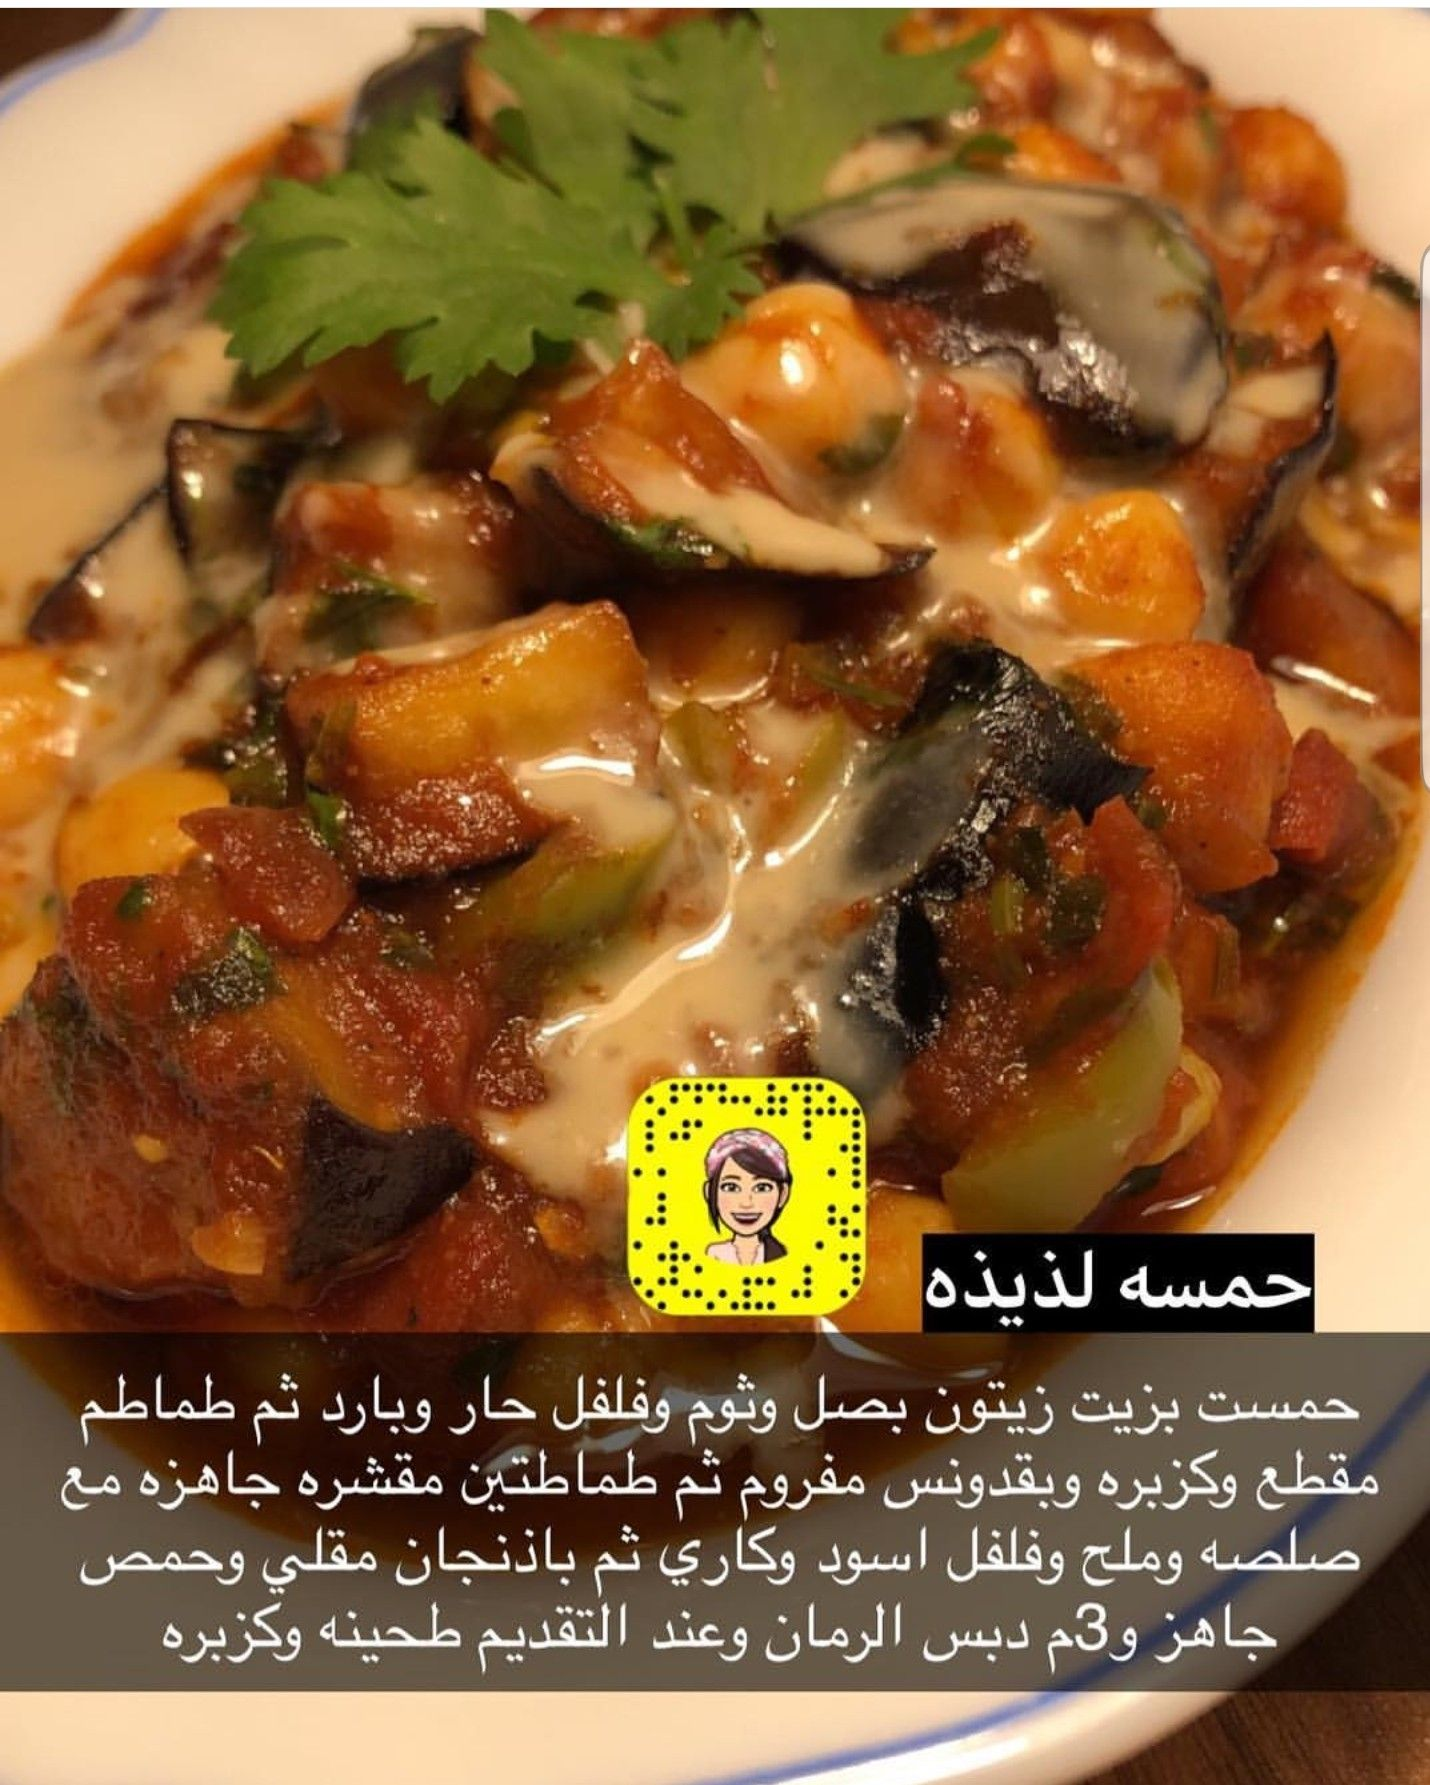 Pin By Lamya Khouri On Food طبخ Cookout Food Food Receipes Food Recipies